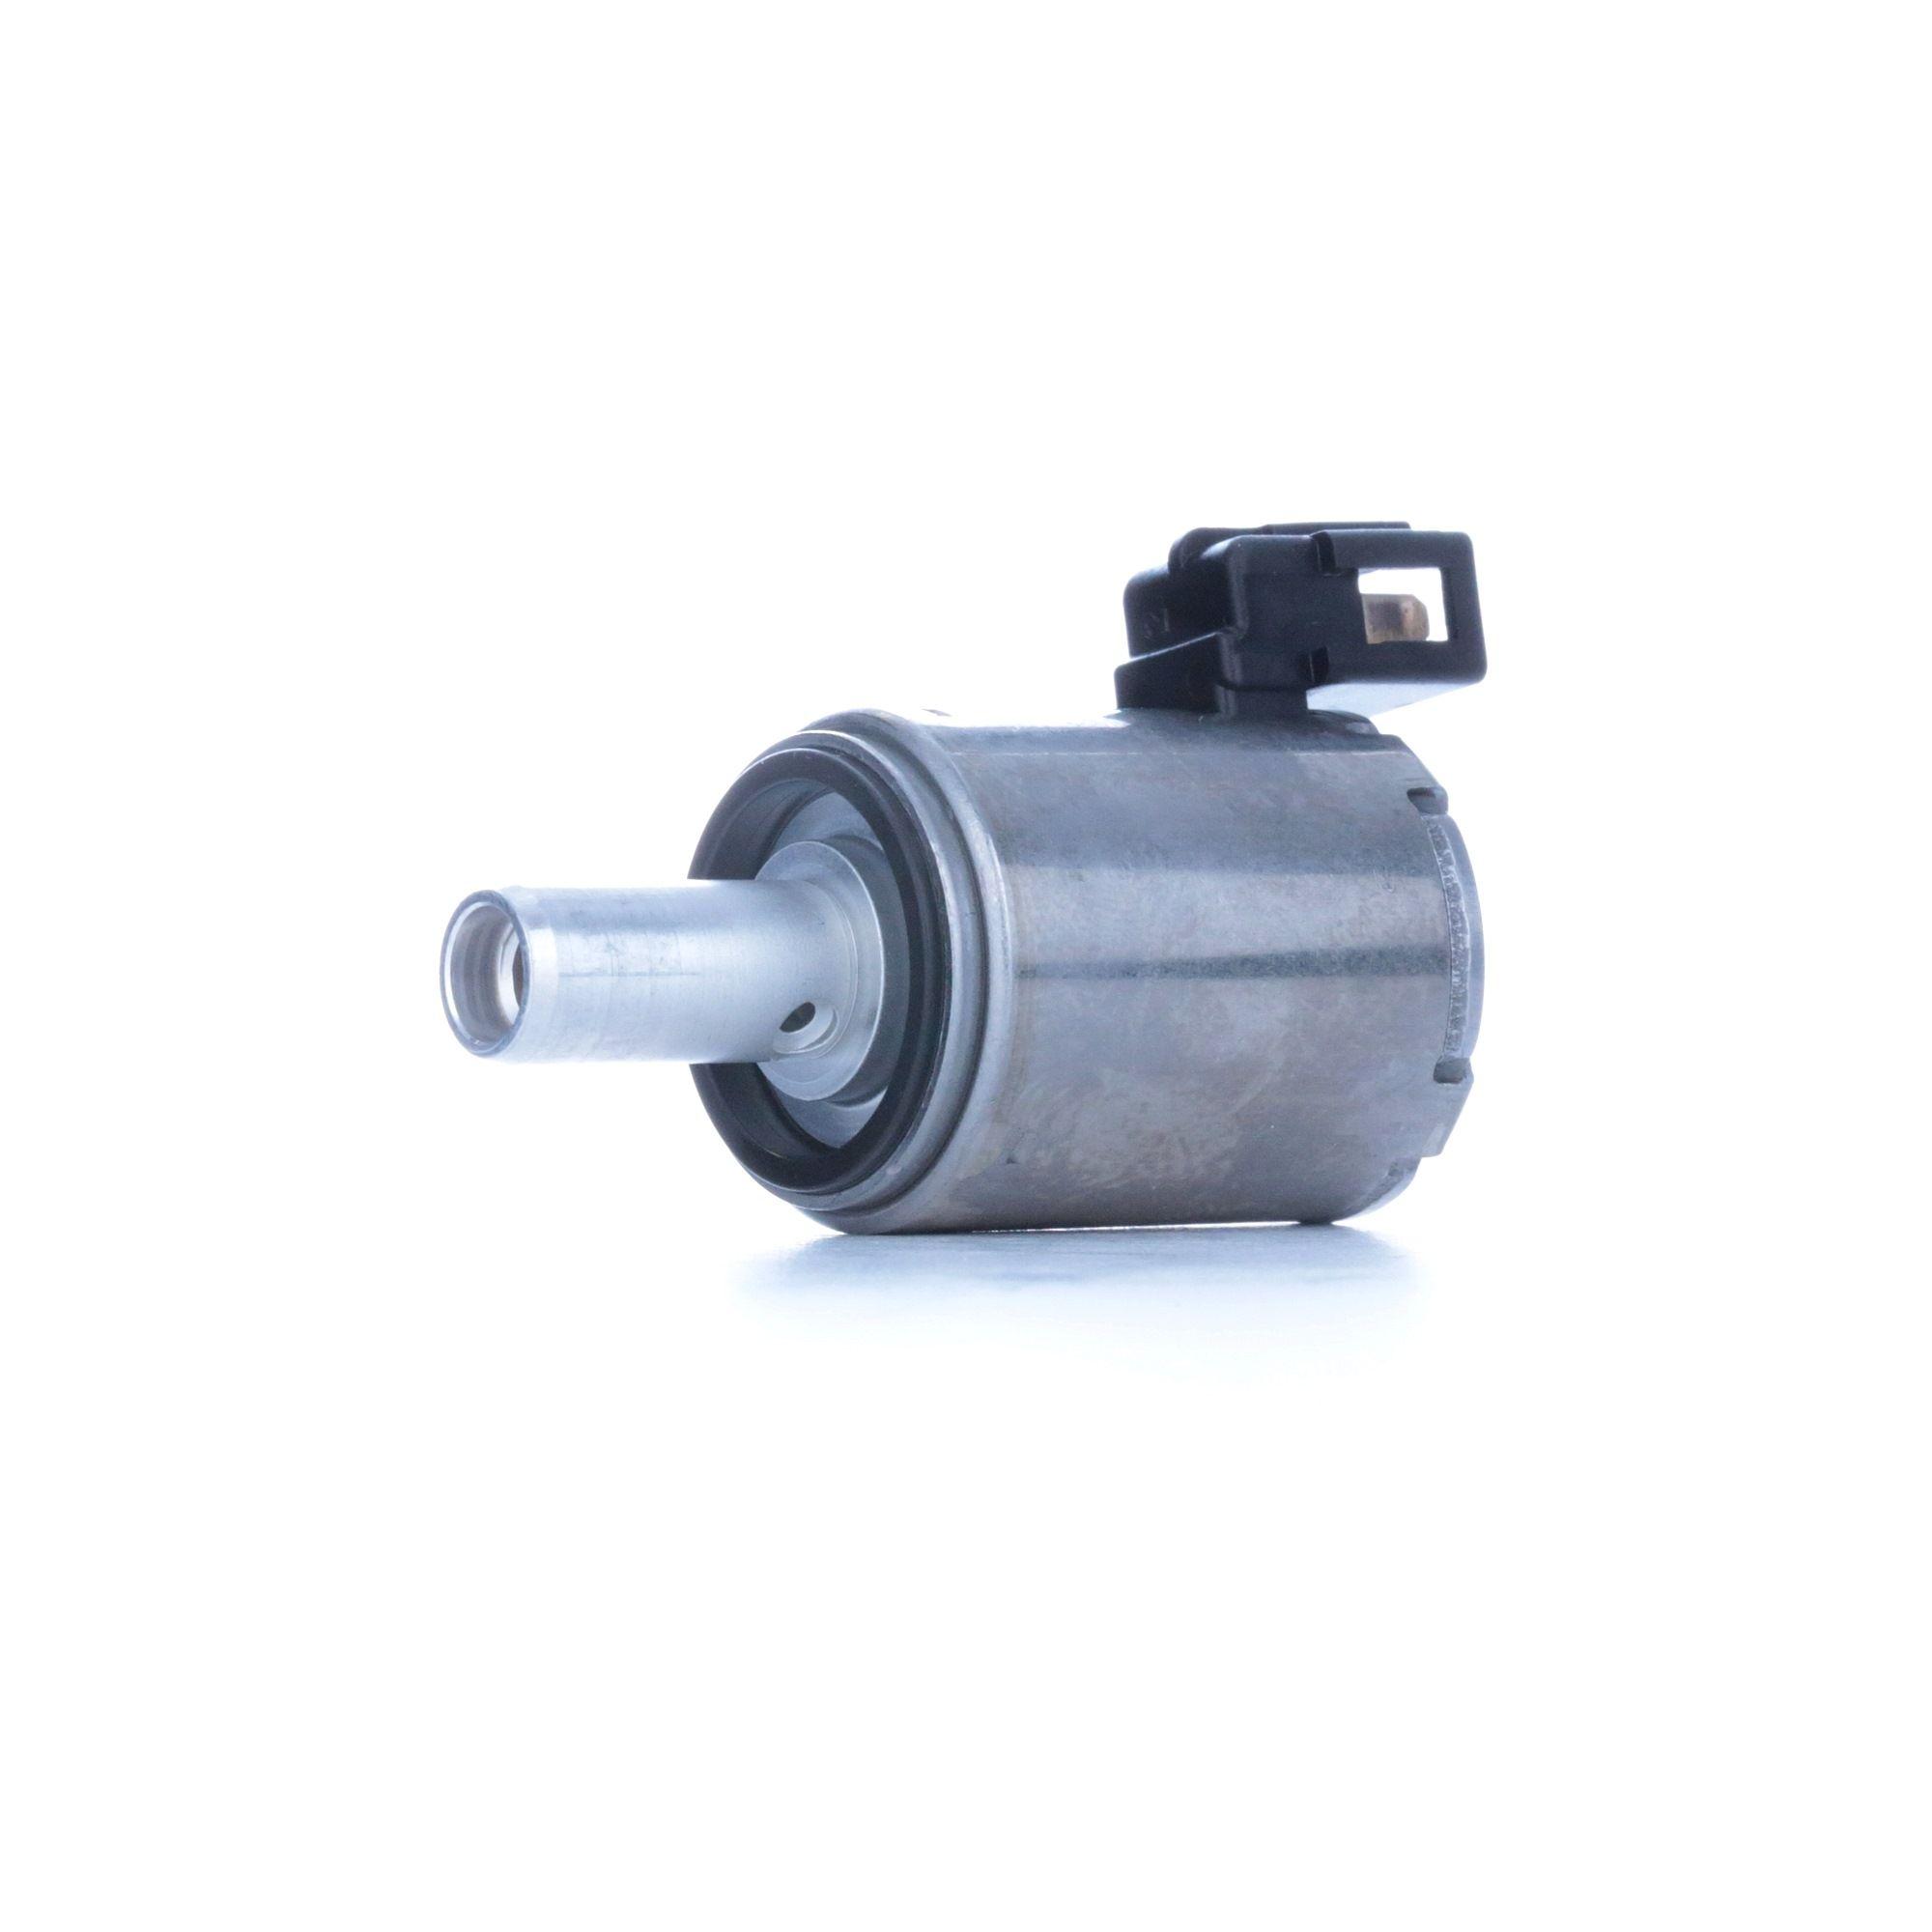 CITROËN JUMPER Schaltventil, Automatikgetriebe - Original FEBI BILSTEIN 38420